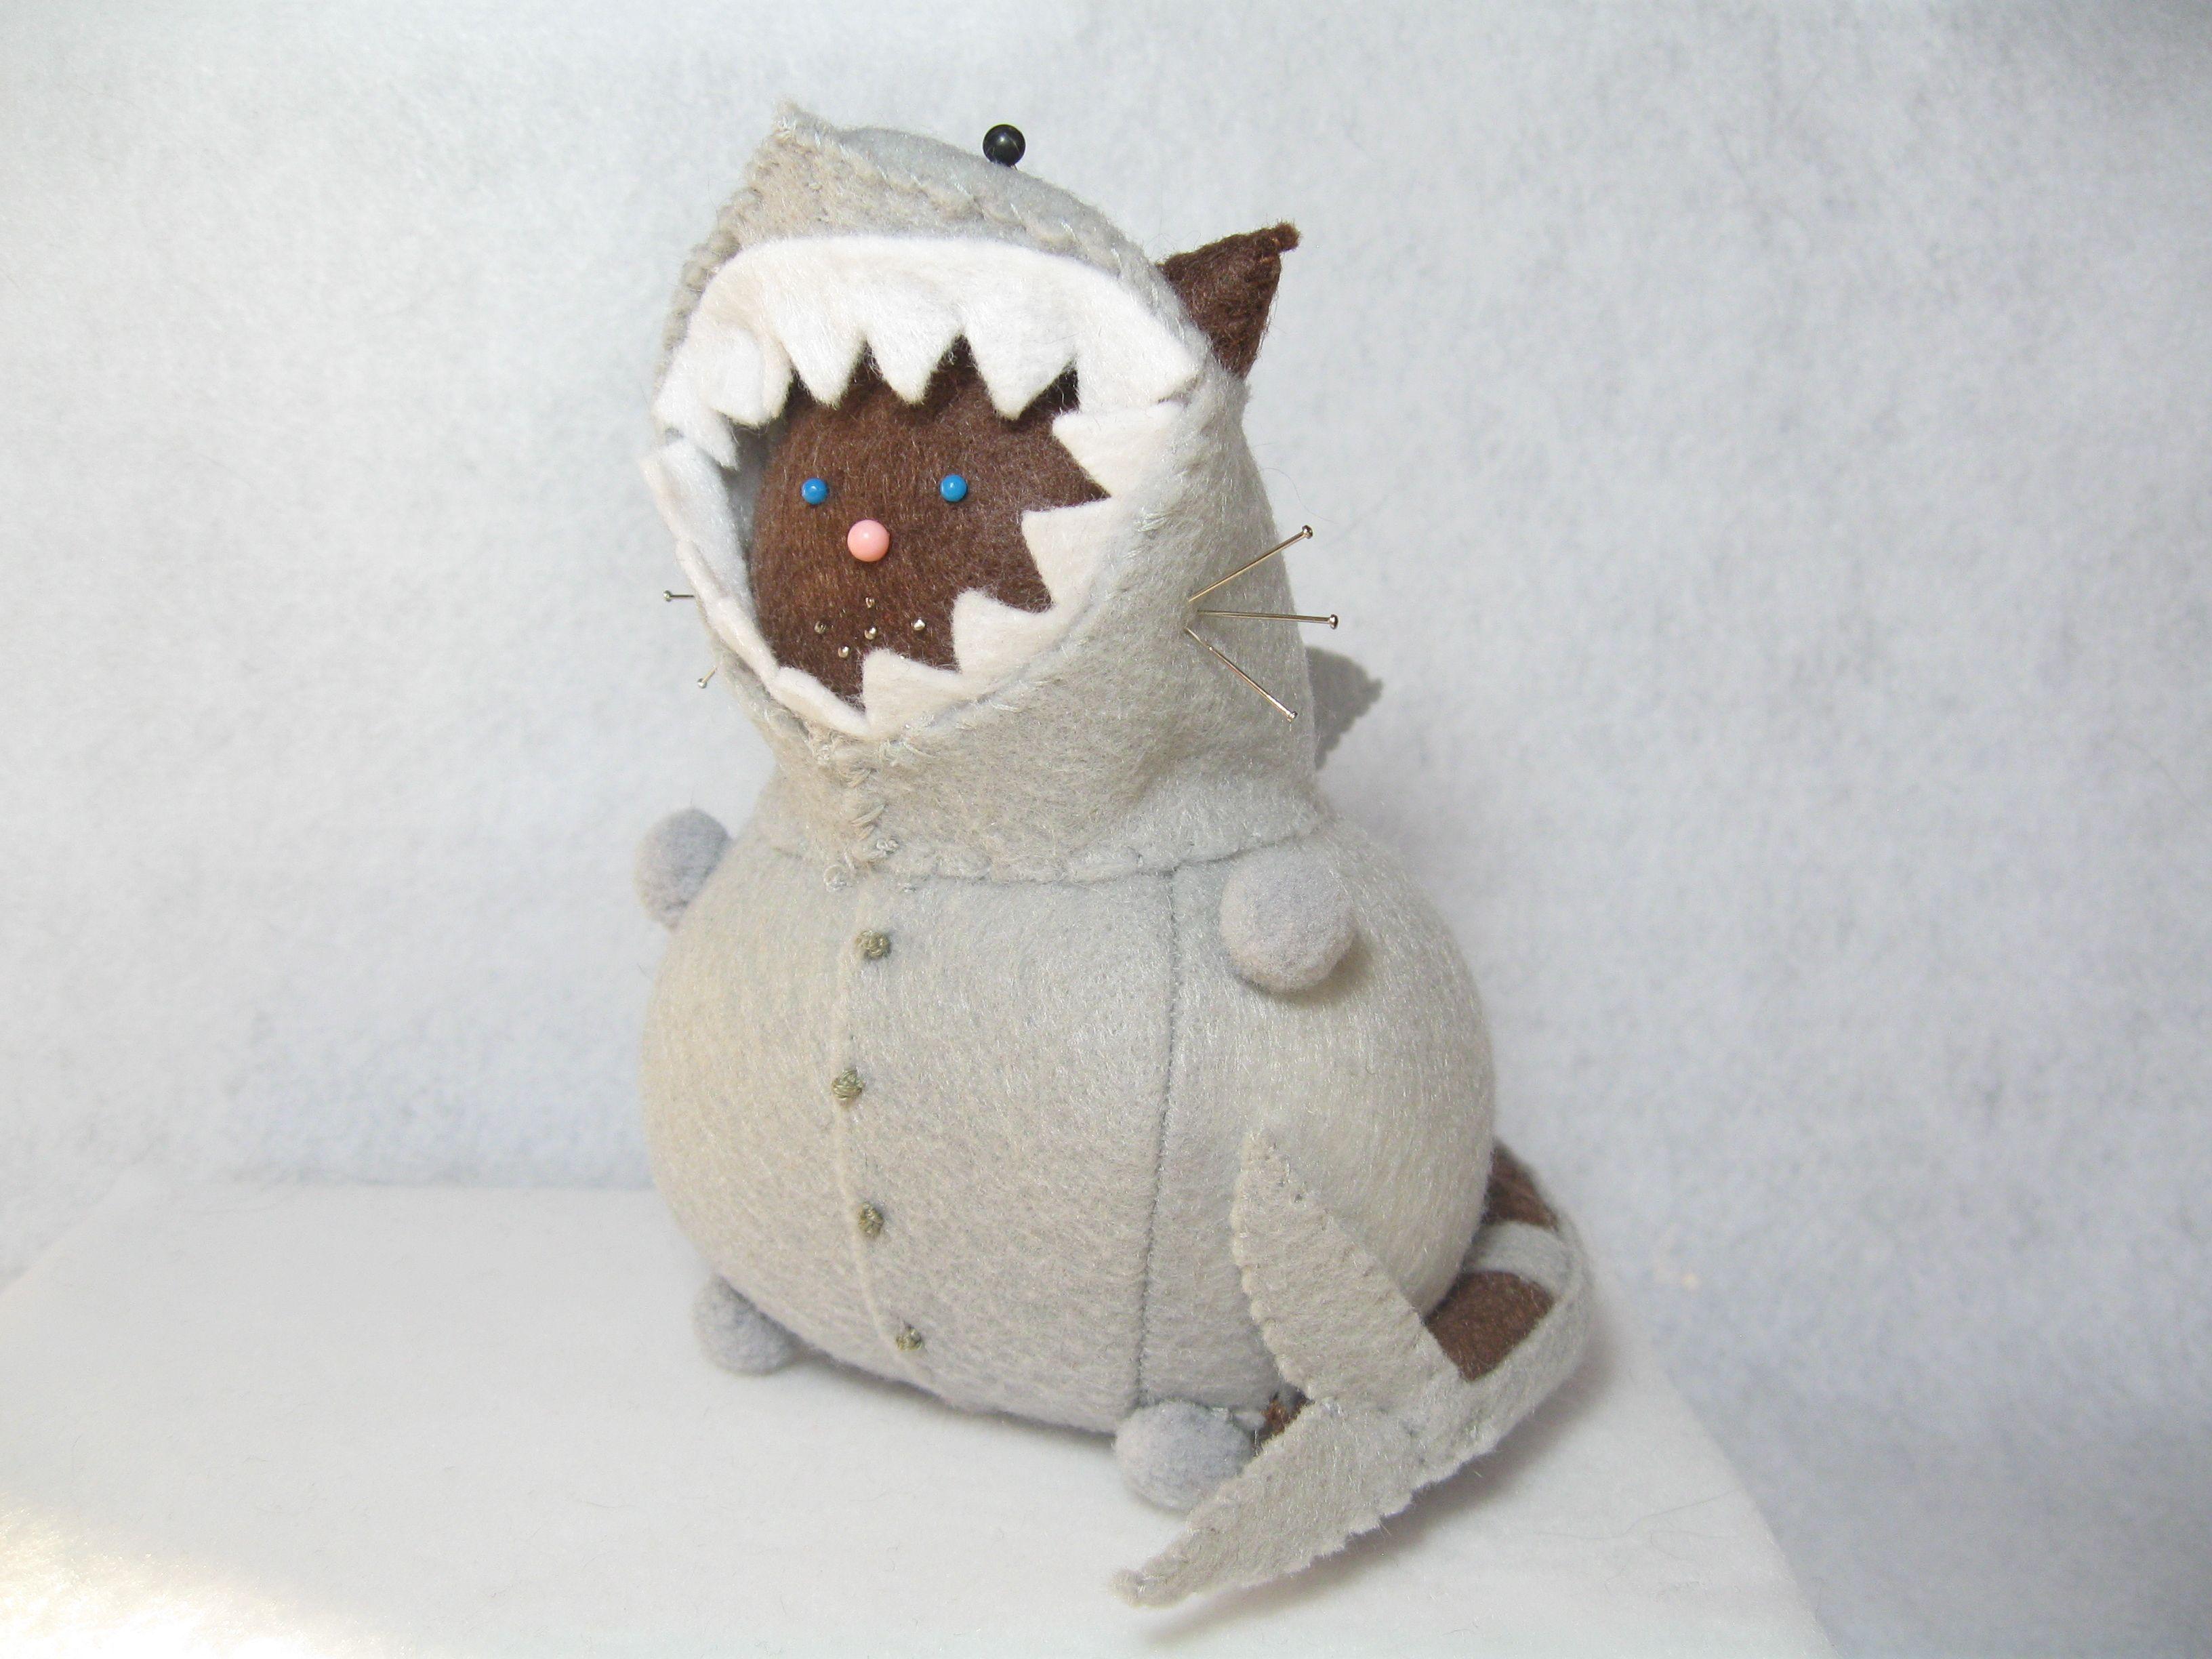 Handmade shark cat pincushion by FatCatCrafts on Etsy